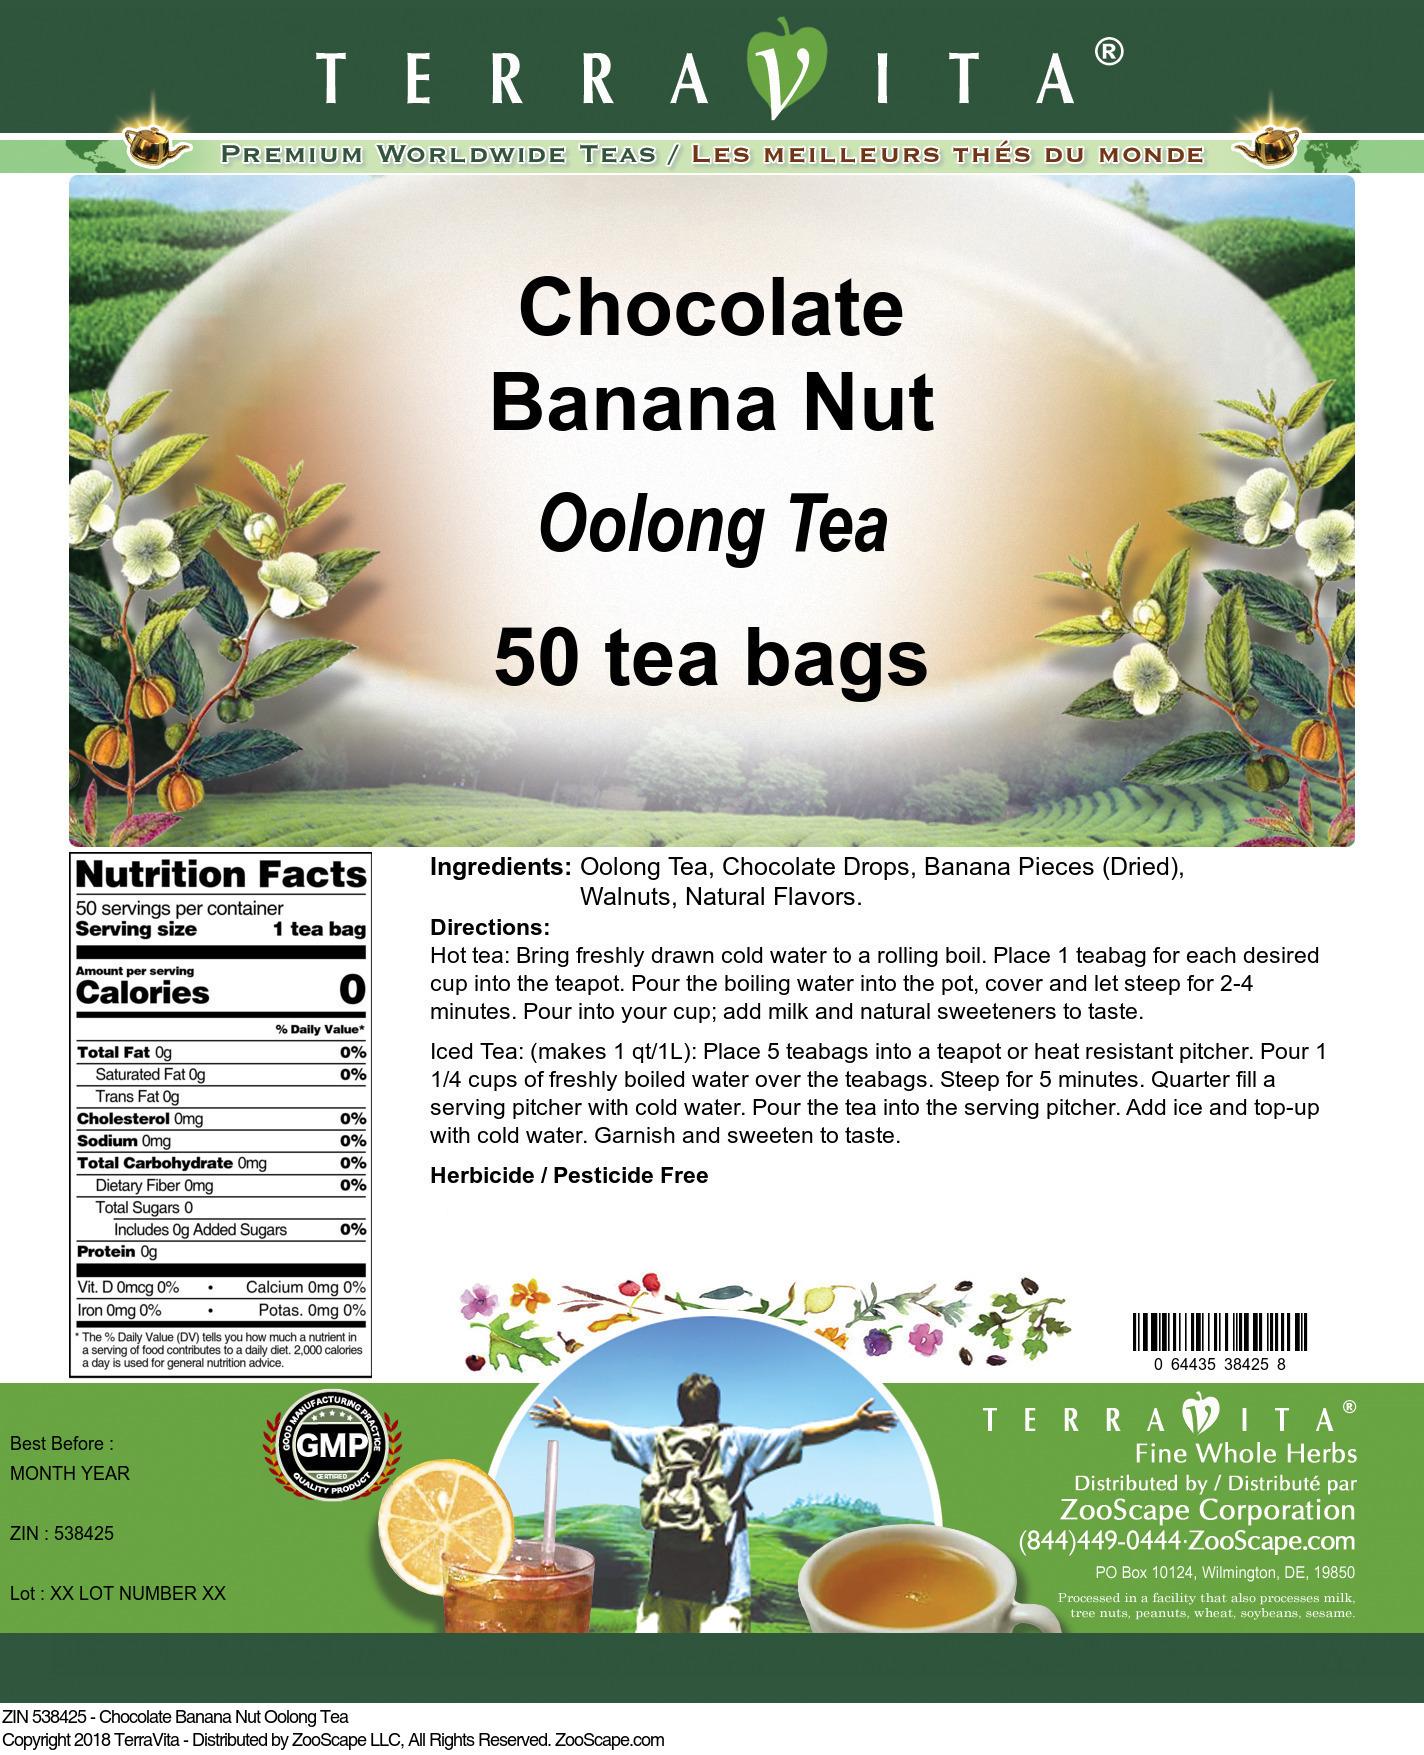 Chocolate Banana Nut Oolong Tea